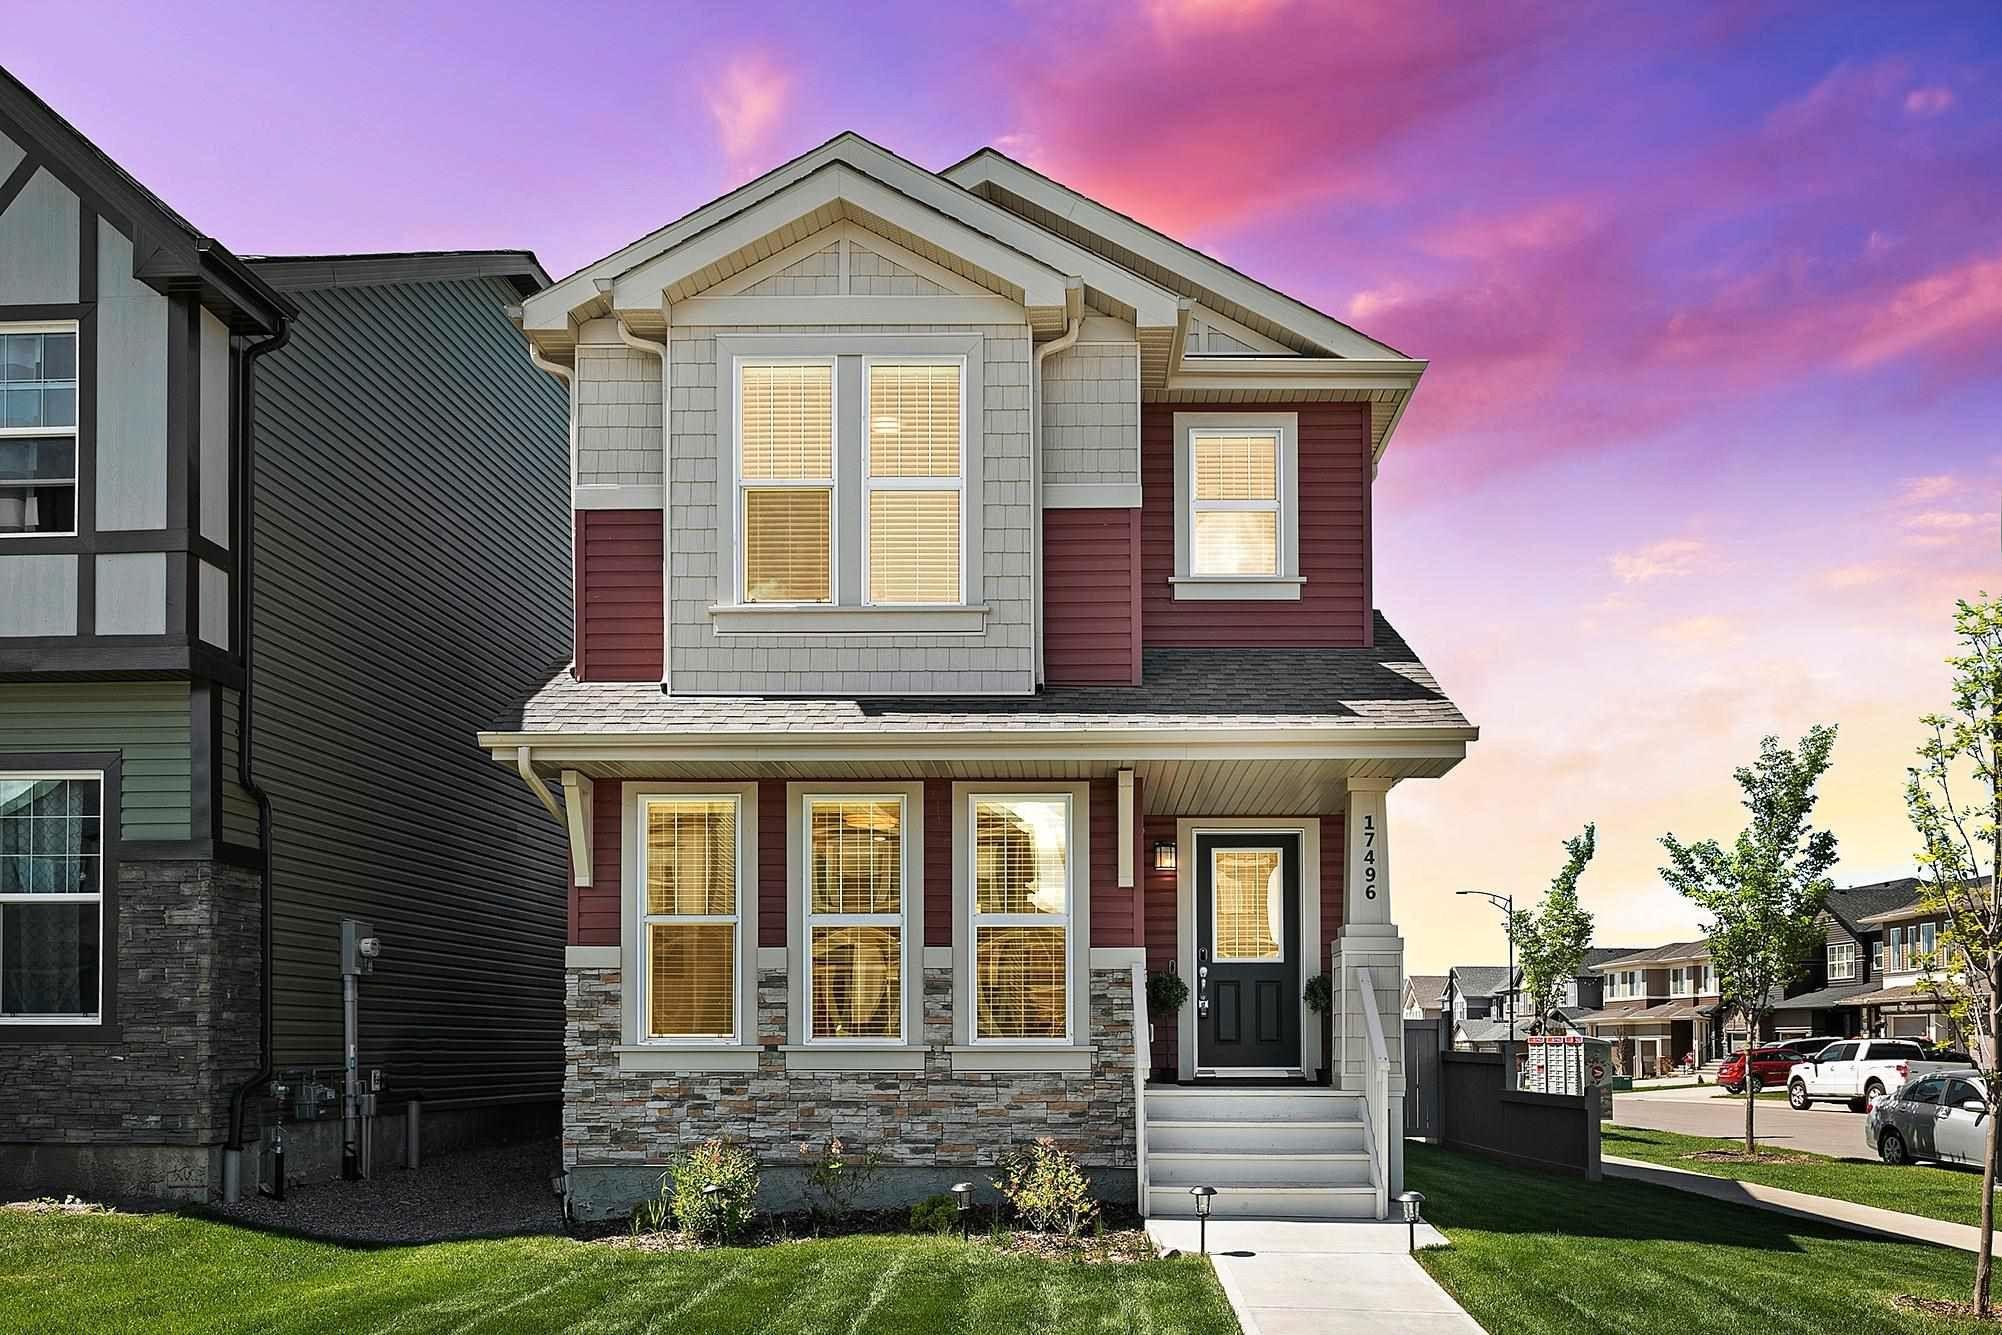 Main Photo: 17496 77 Street in Edmonton: Zone 28 House for sale : MLS®# E4248254